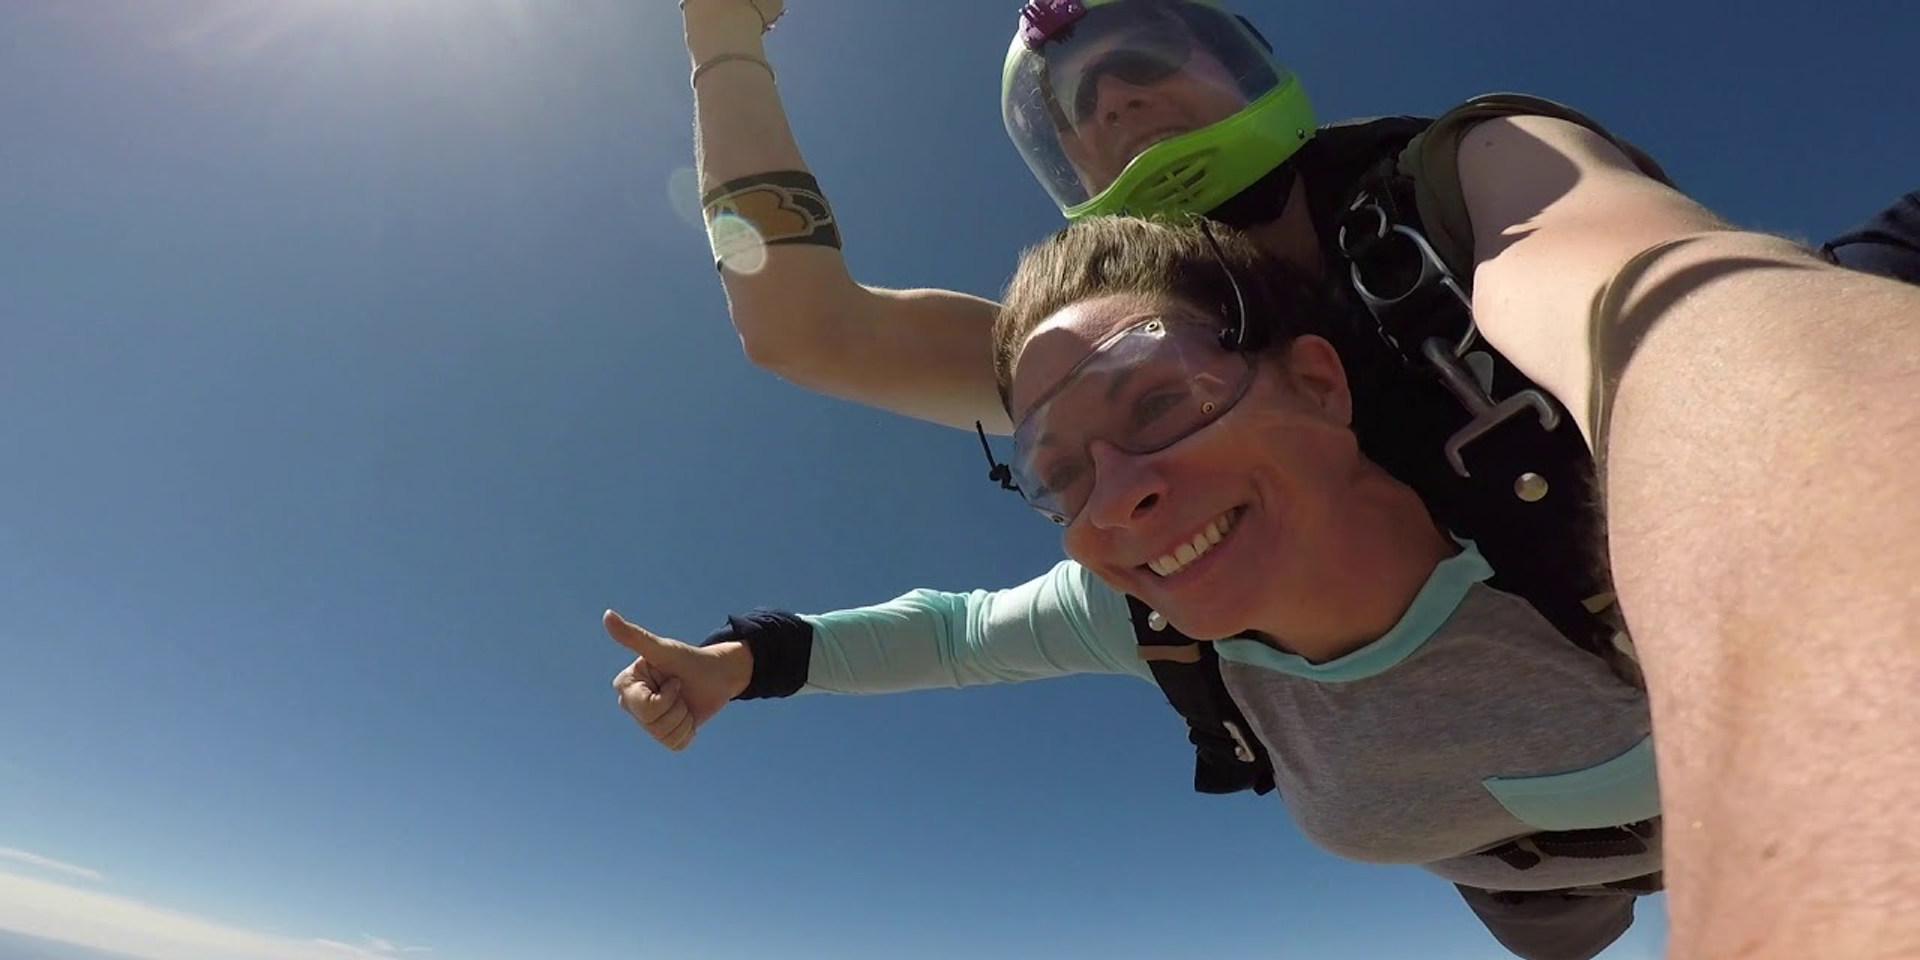 Leslie's June 2019 First Time Tandem Skydive in Hollister, CA